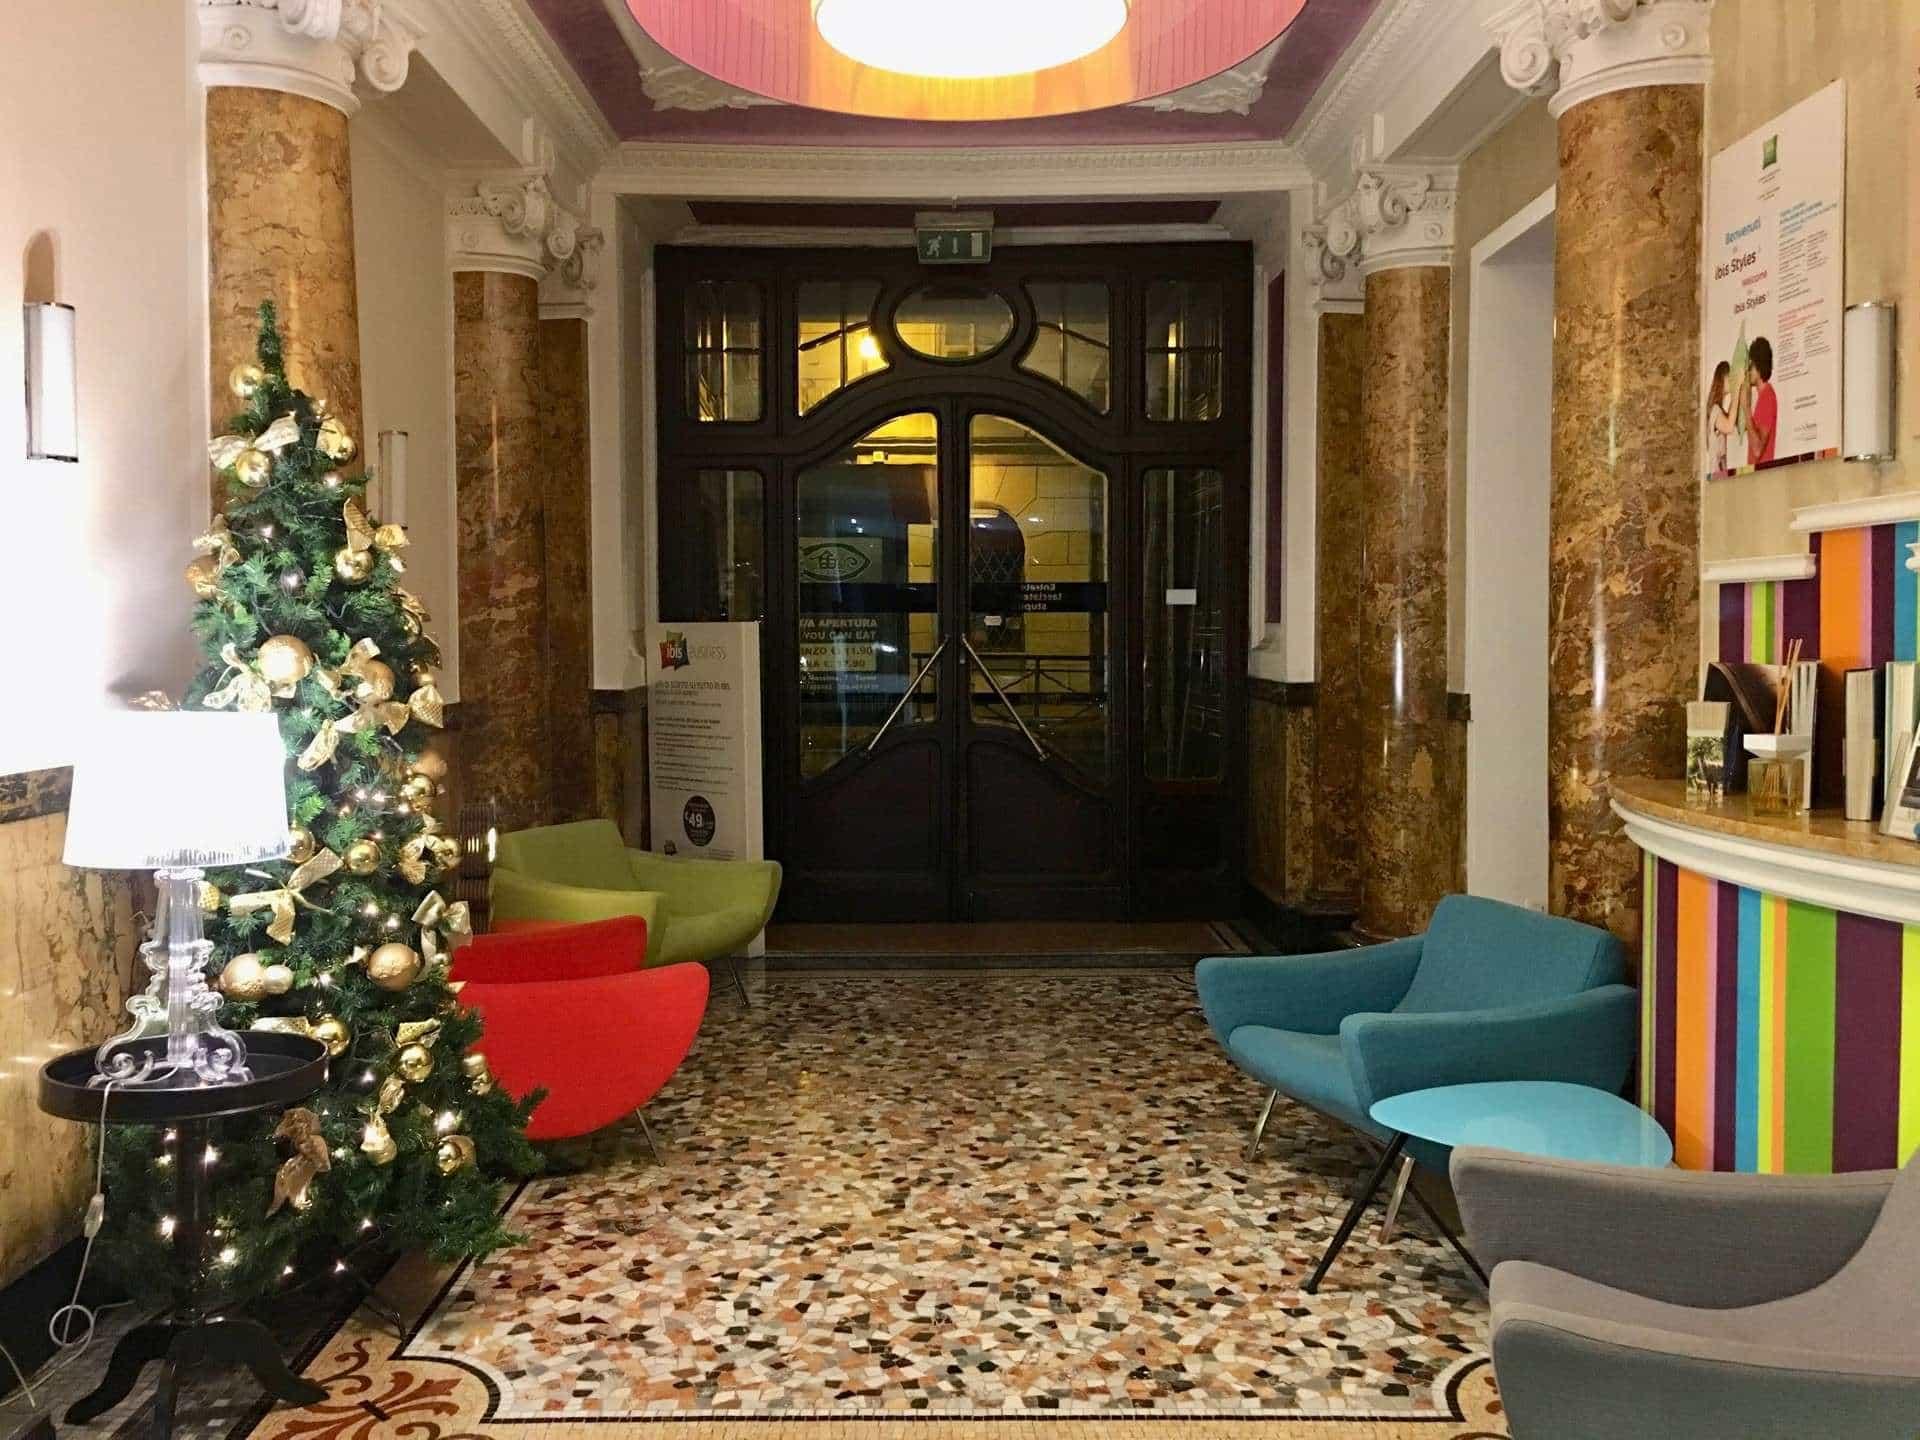 ibis Styles Torino Porta Nuova hotel review